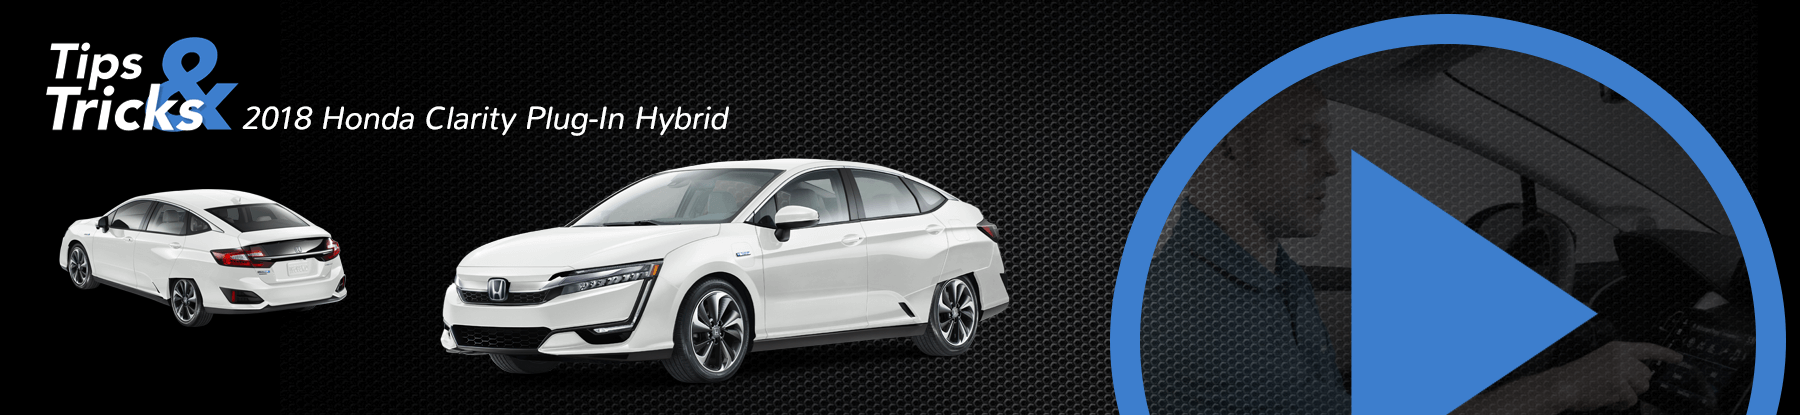 2018 Honda Clarity Plug-In Hybrid Tips and Tricks